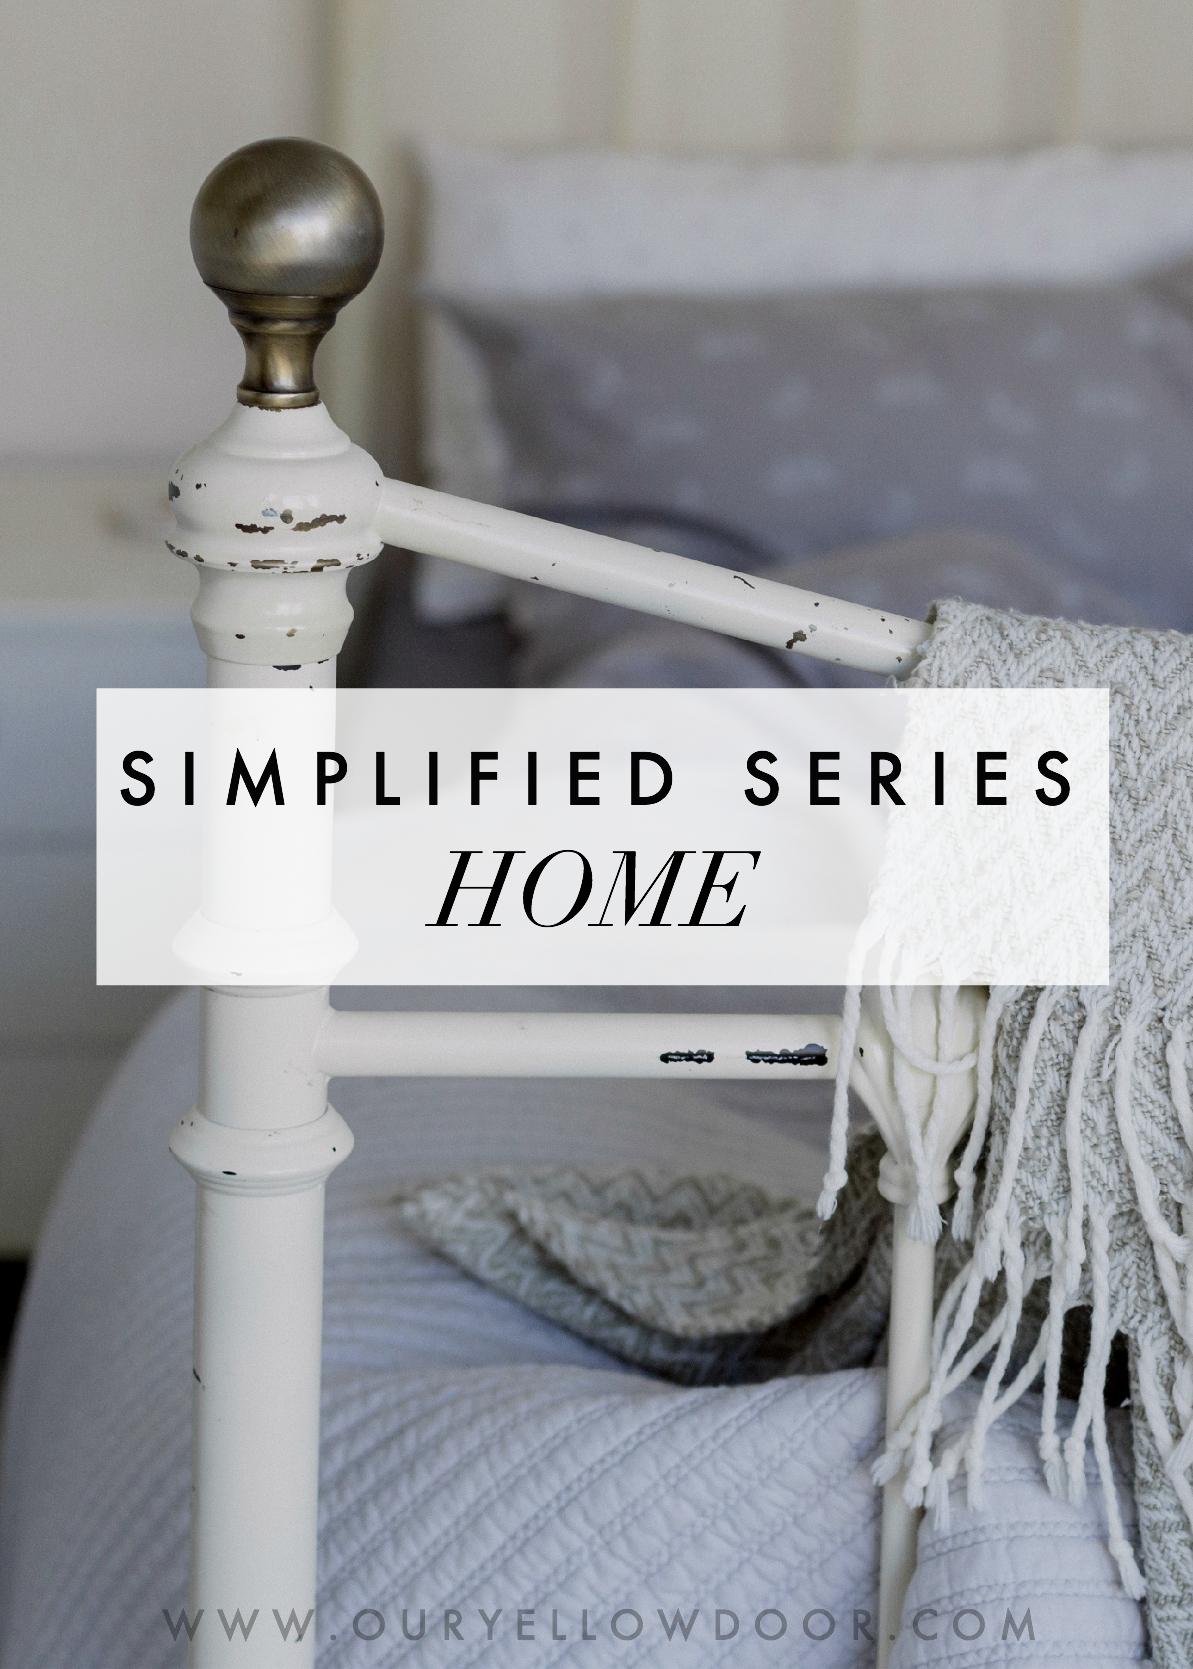 Simplified Series Home